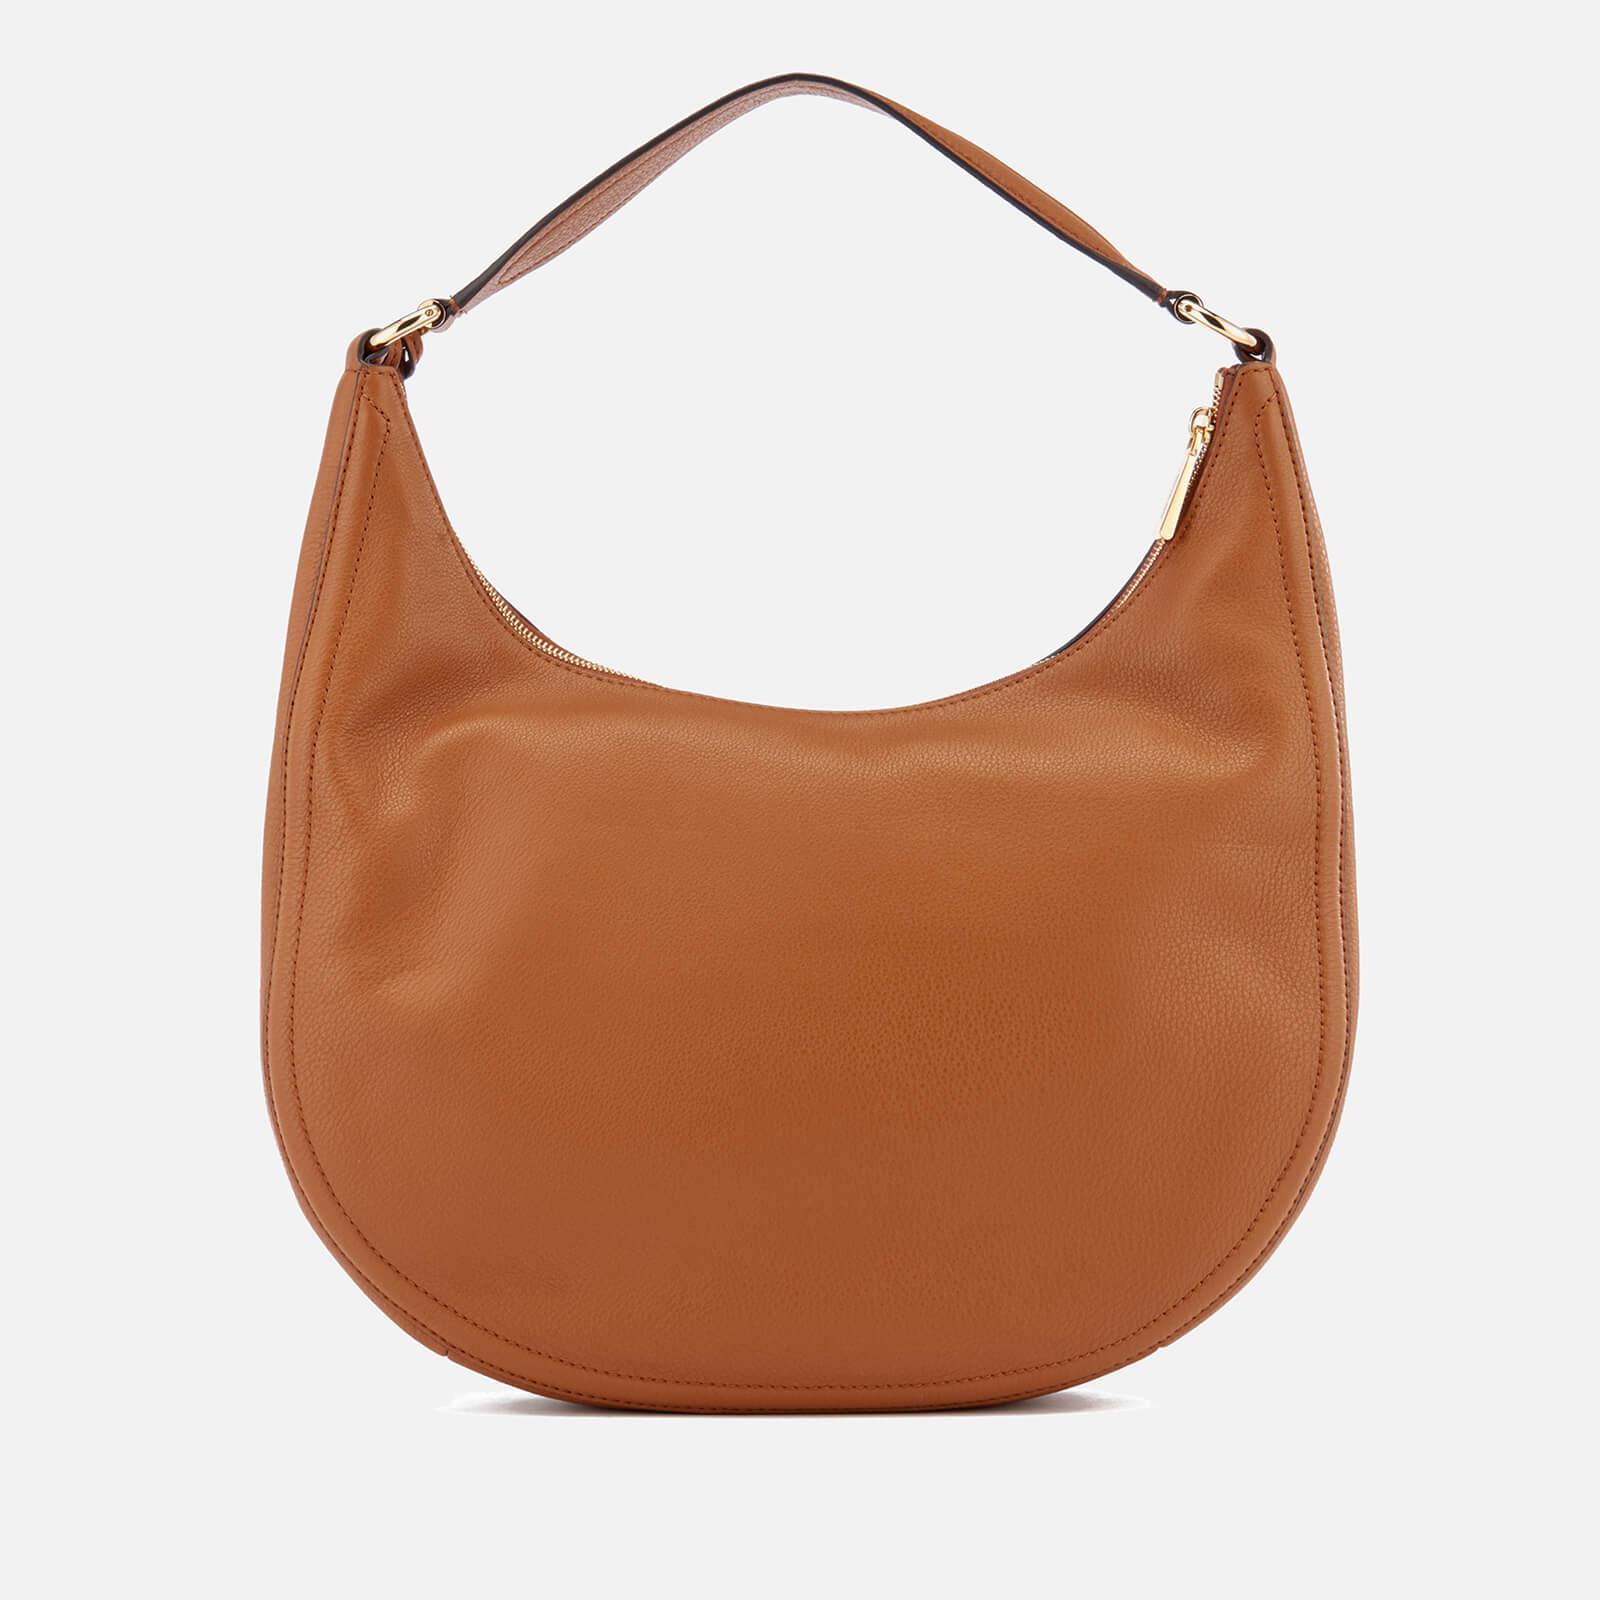 5df13897414a Lyst - MICHAEL Michael Kors Lydia Large Hobo Bag in Brown